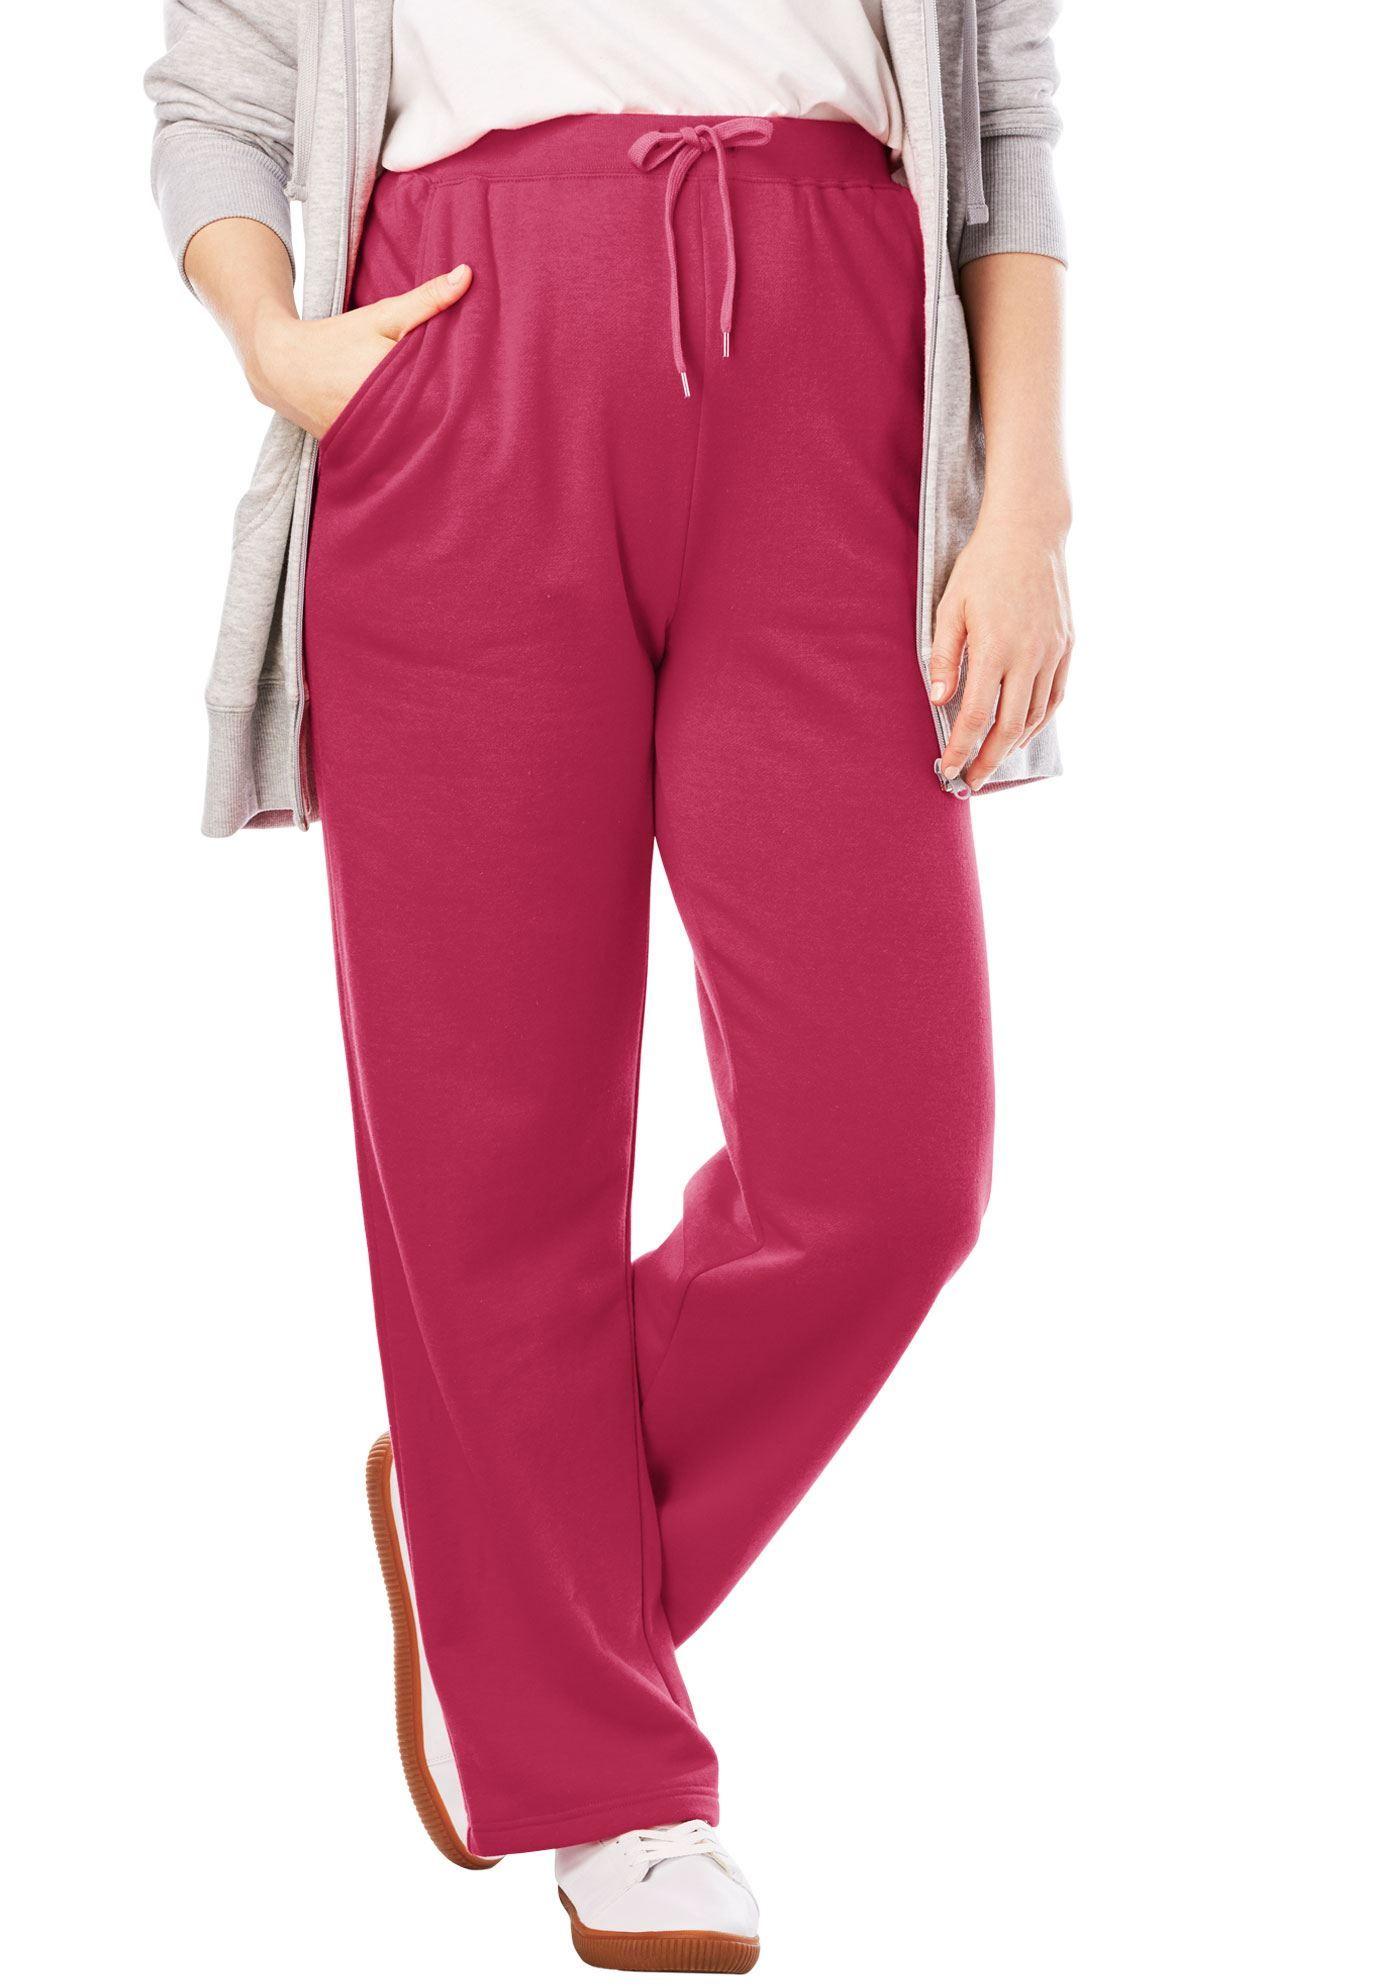 964a8ed398d Sweat Pants Easy Fleece - Women s Plus Size Clothing